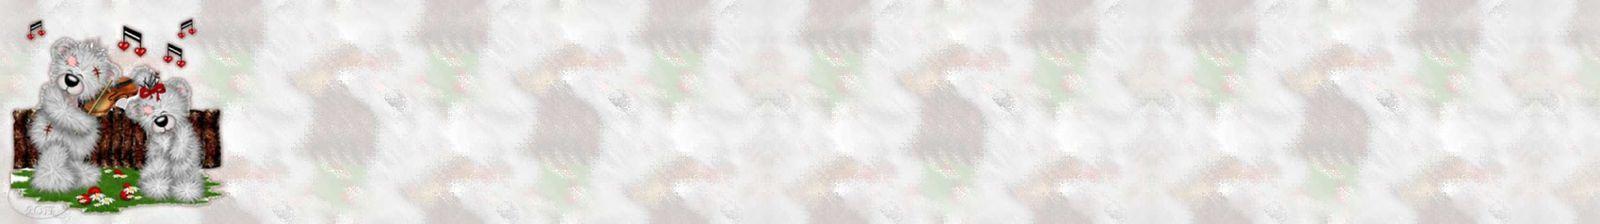 Creddy Violon Incredimail &amp&#x3B; Papier A4 h l &amp&#x3B; outlook &amp&#x3B; enveloppe &amp&#x3B; 2 cartes A5